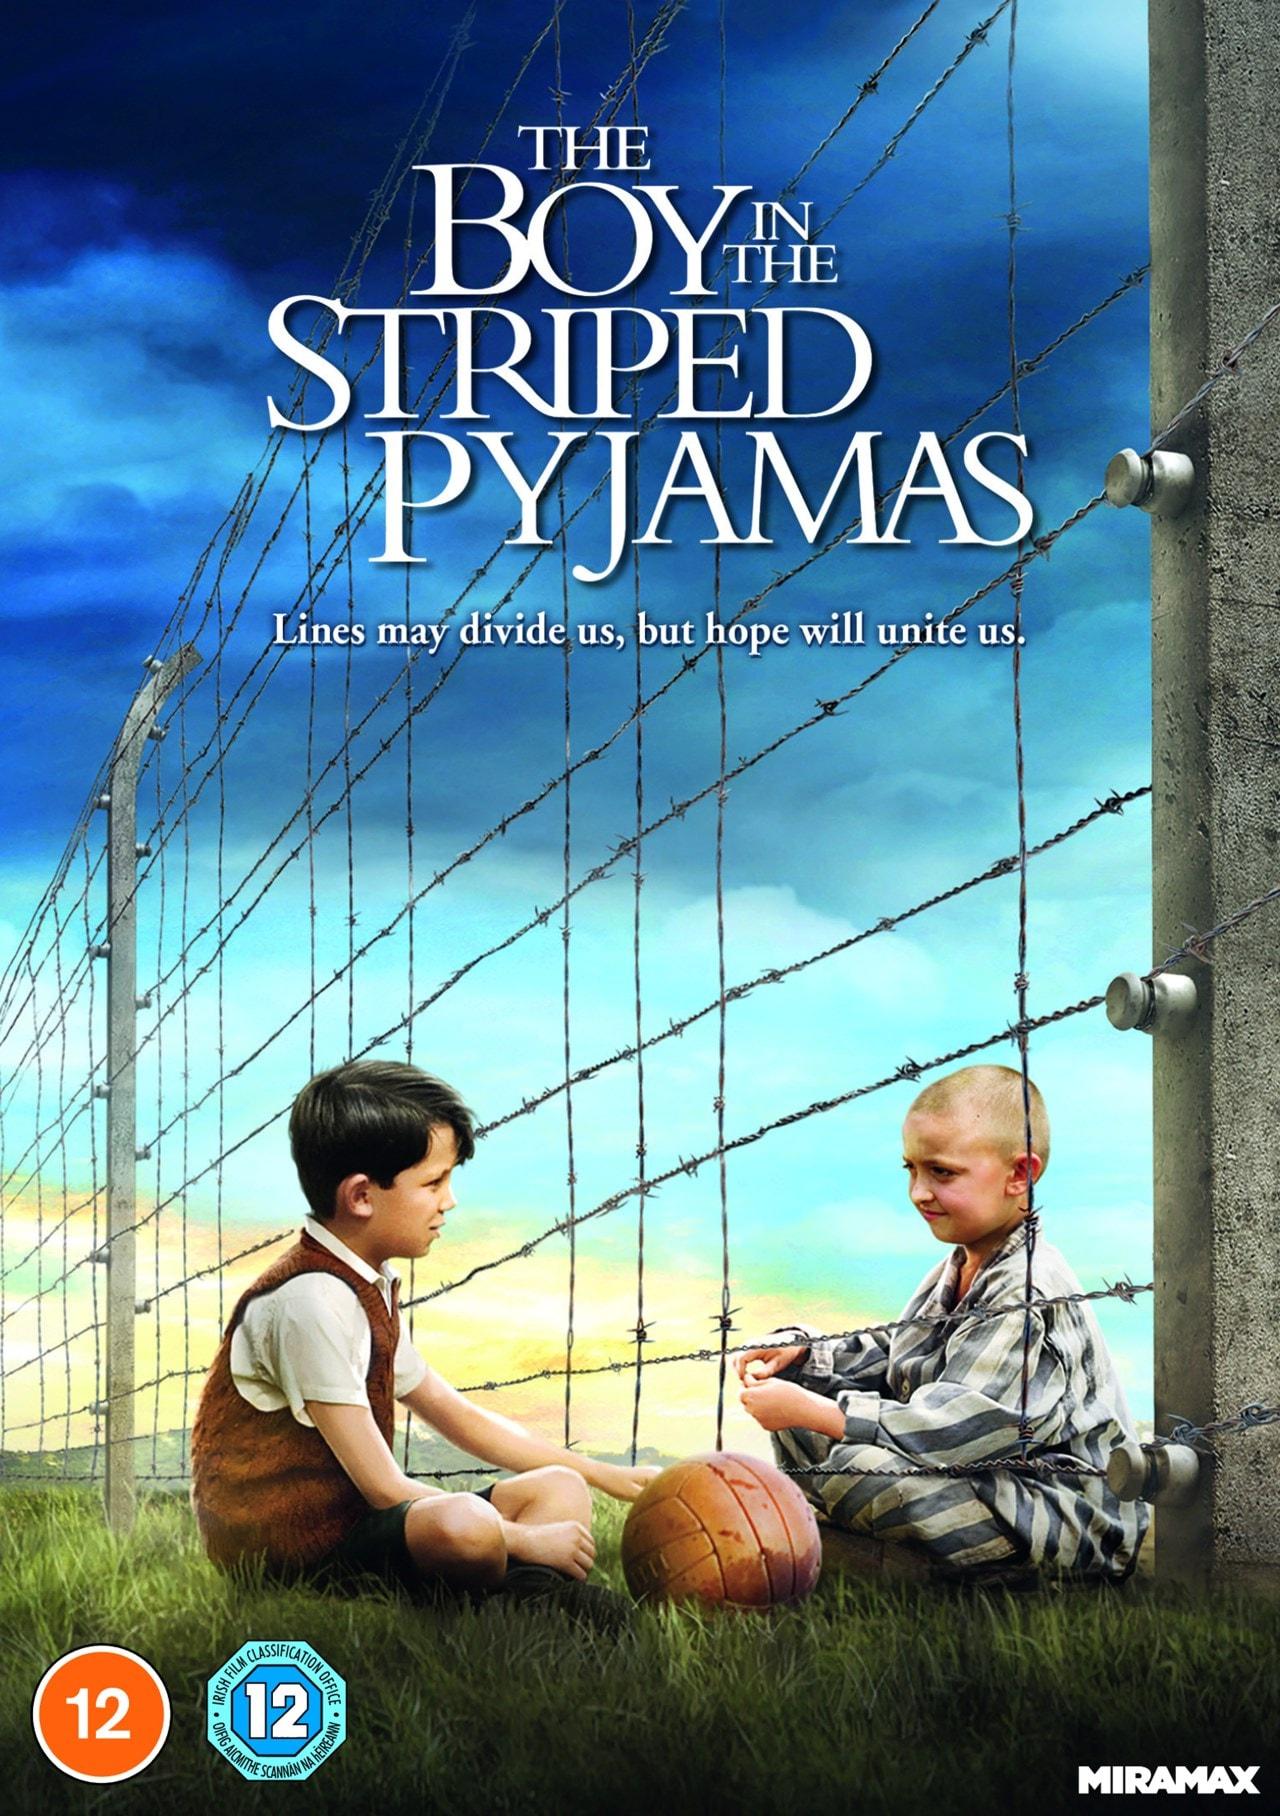 The Boy in the Striped Pyjamas - 1